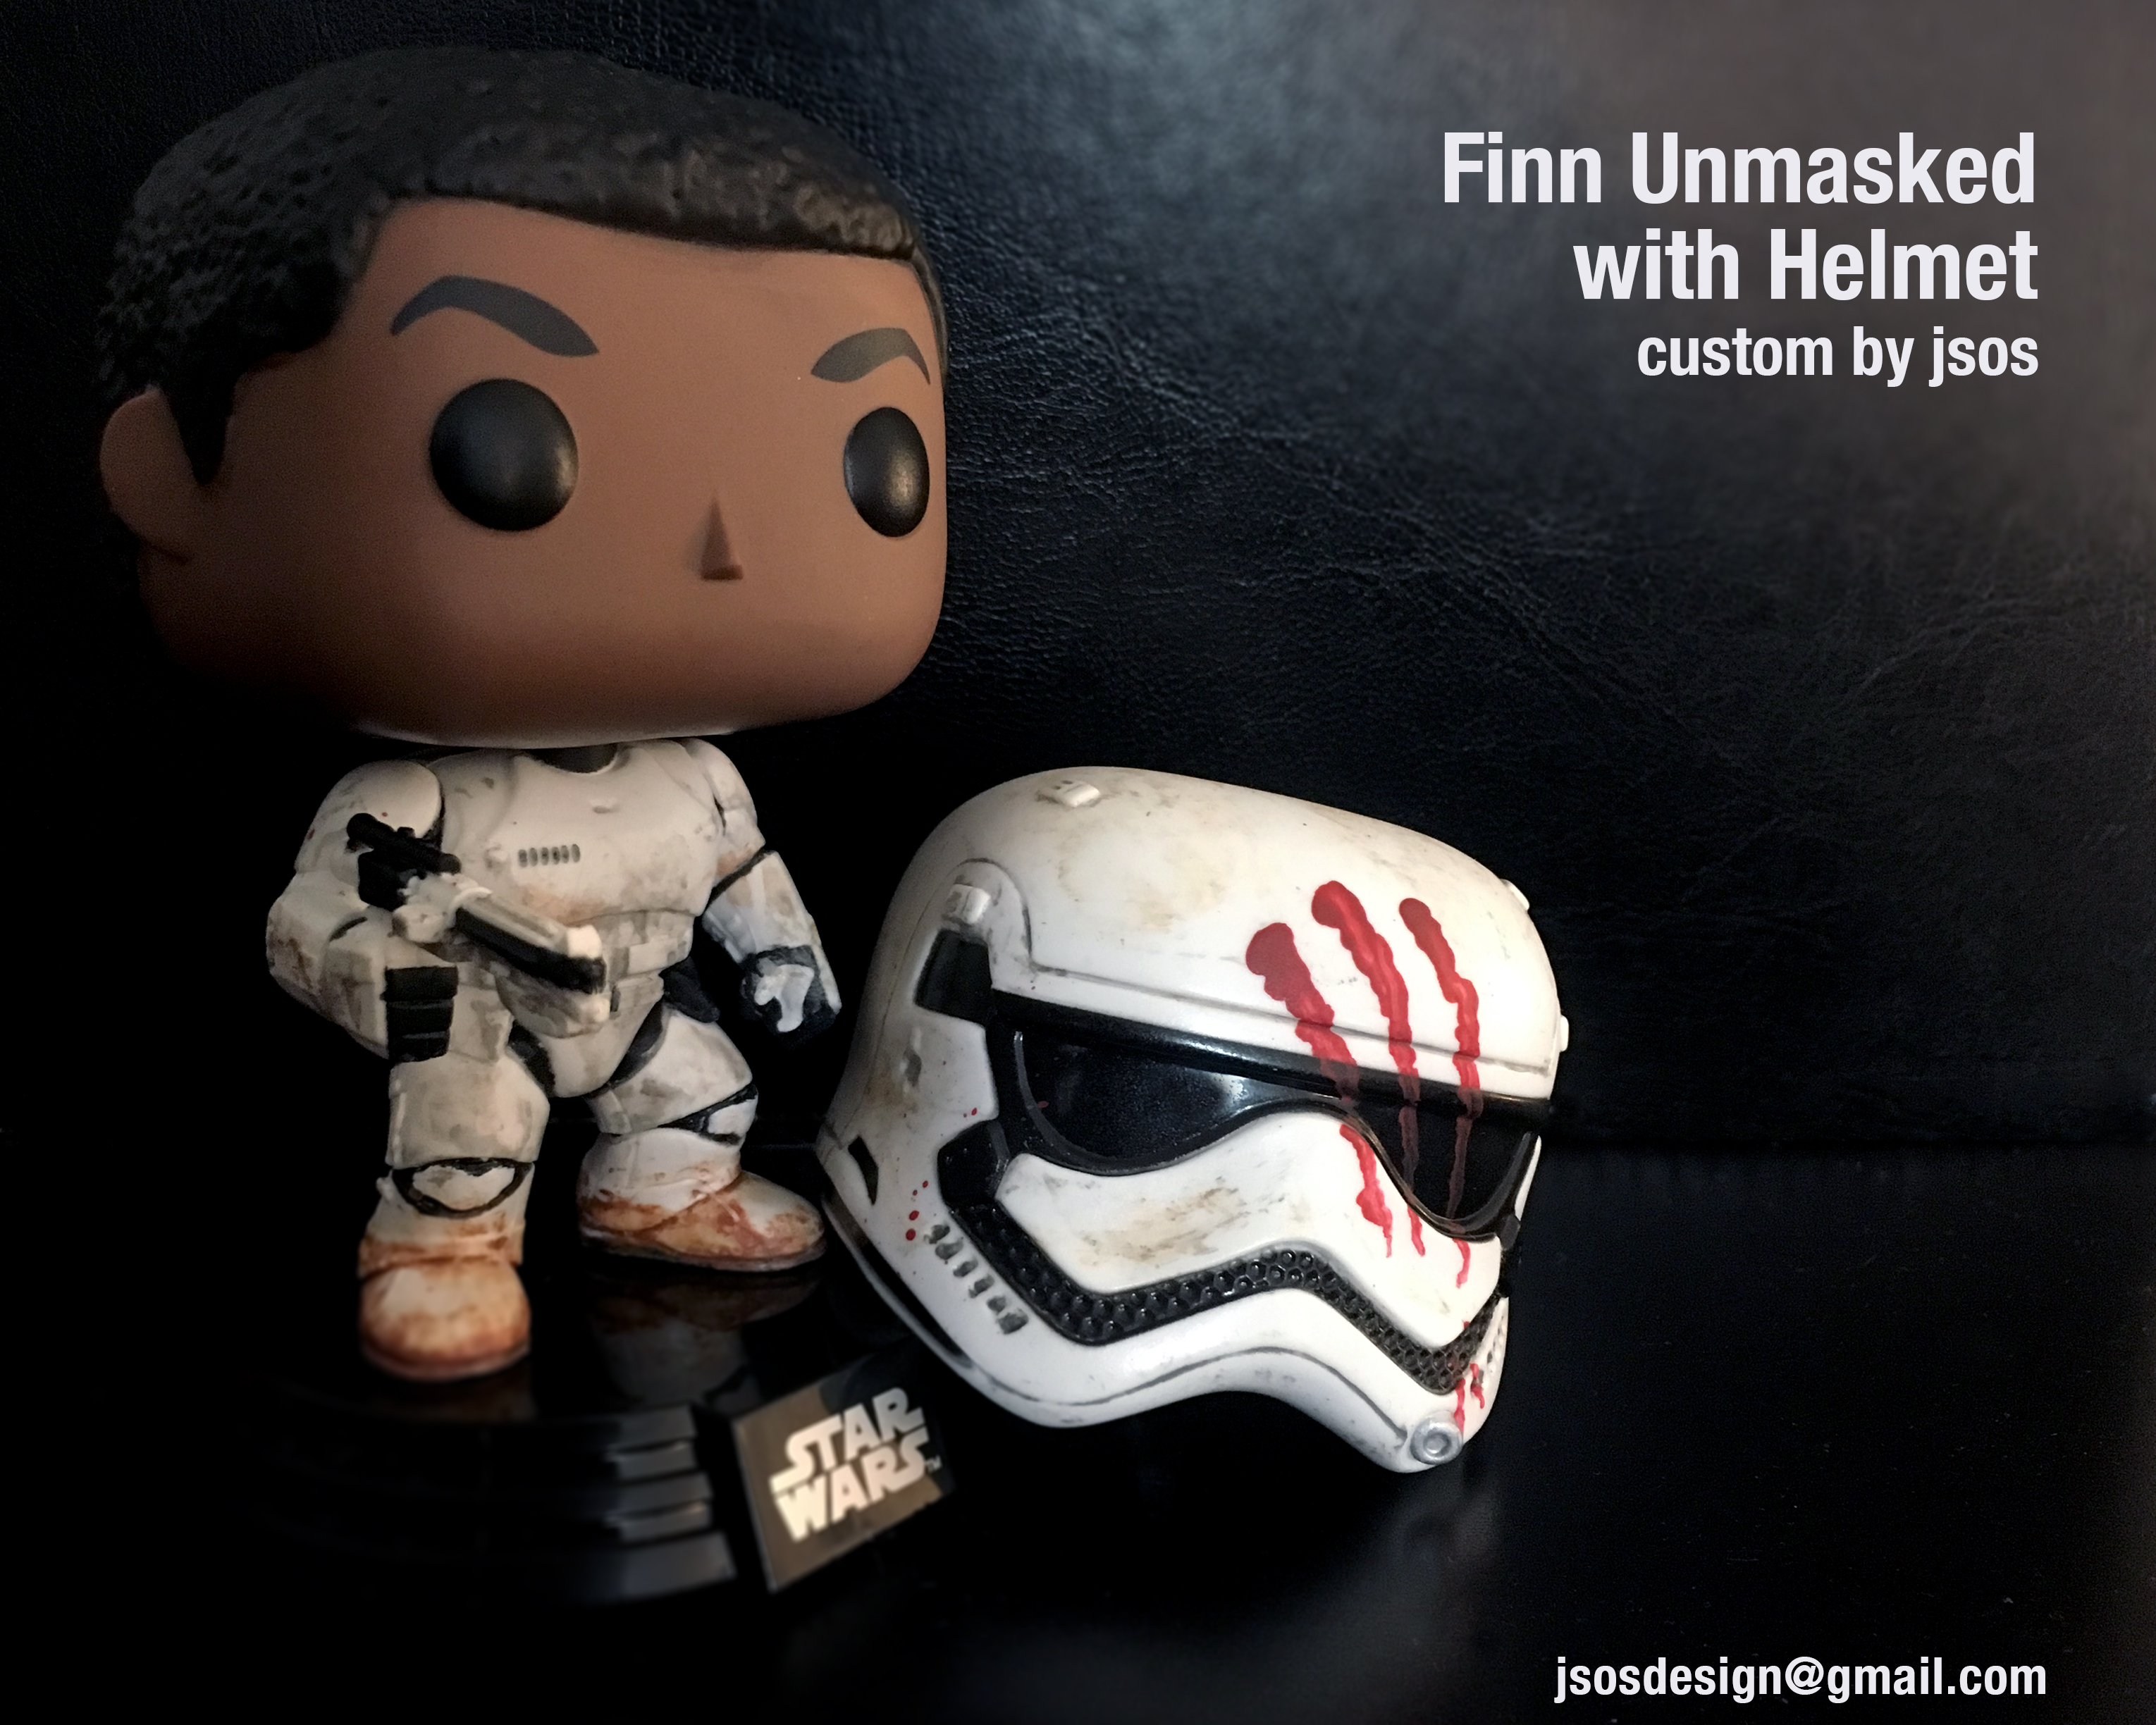 jsos_fn2187_unmasked_w_helmet